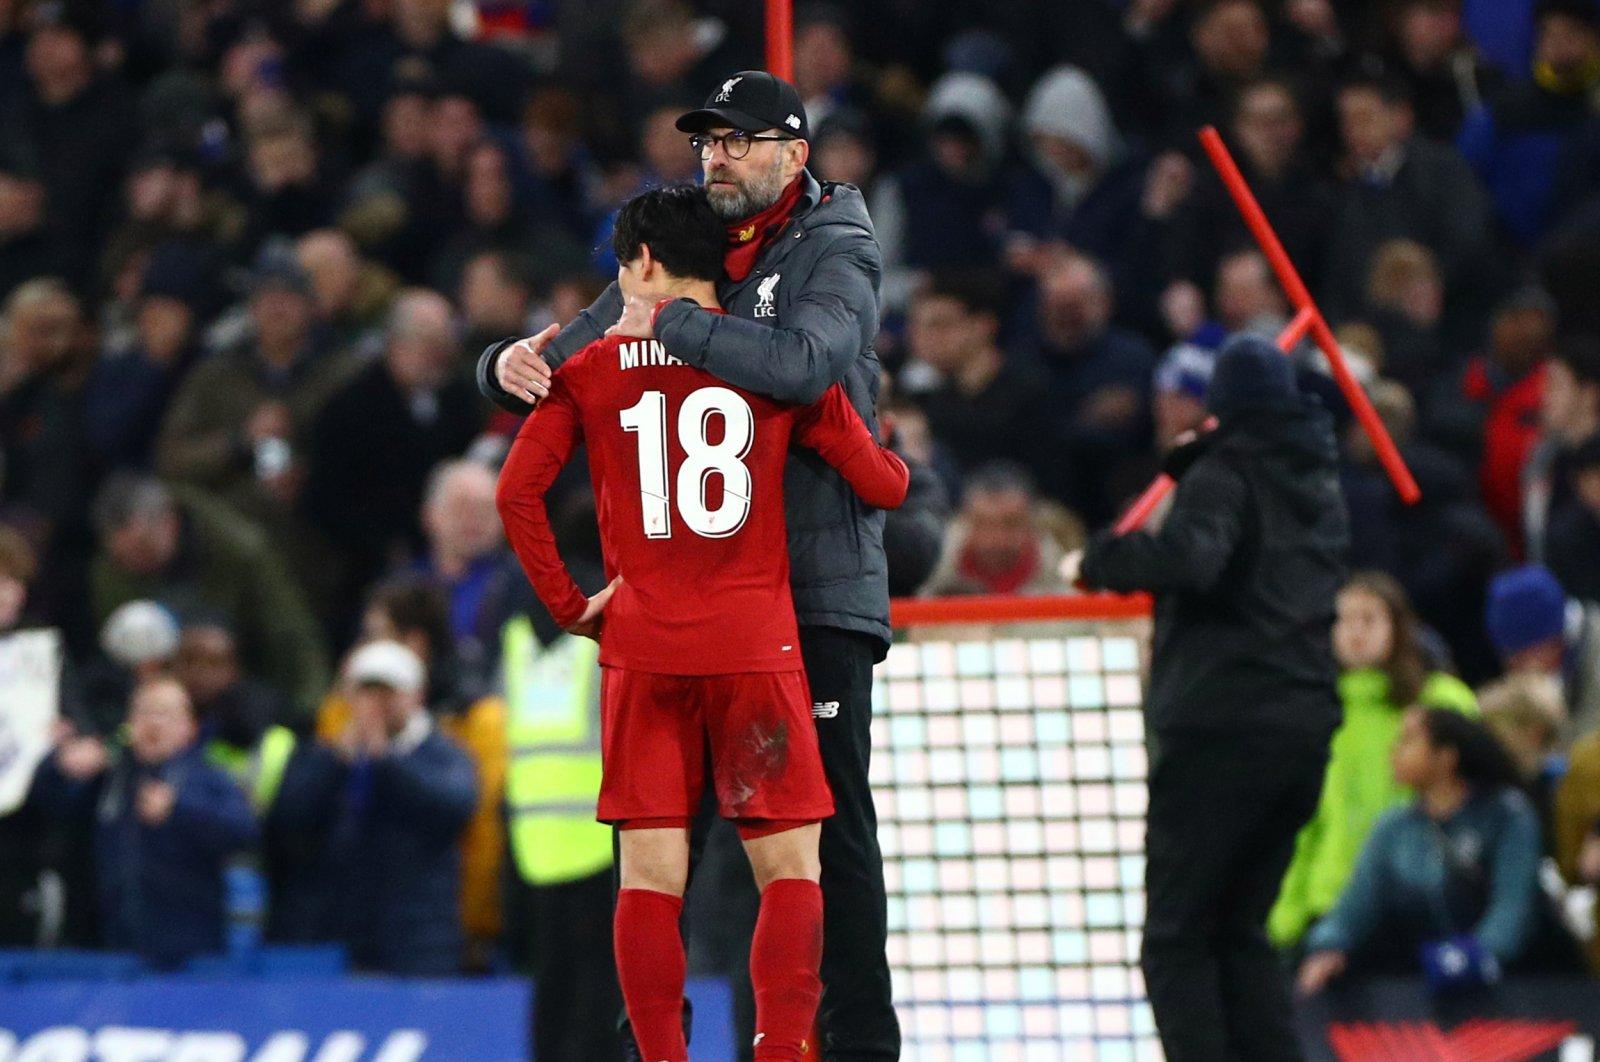 Jurgen Klopp hugs his player Takumi Minamino during a Premier League match against Chelsea in London, March 3, 2020. (Reuters Photo)